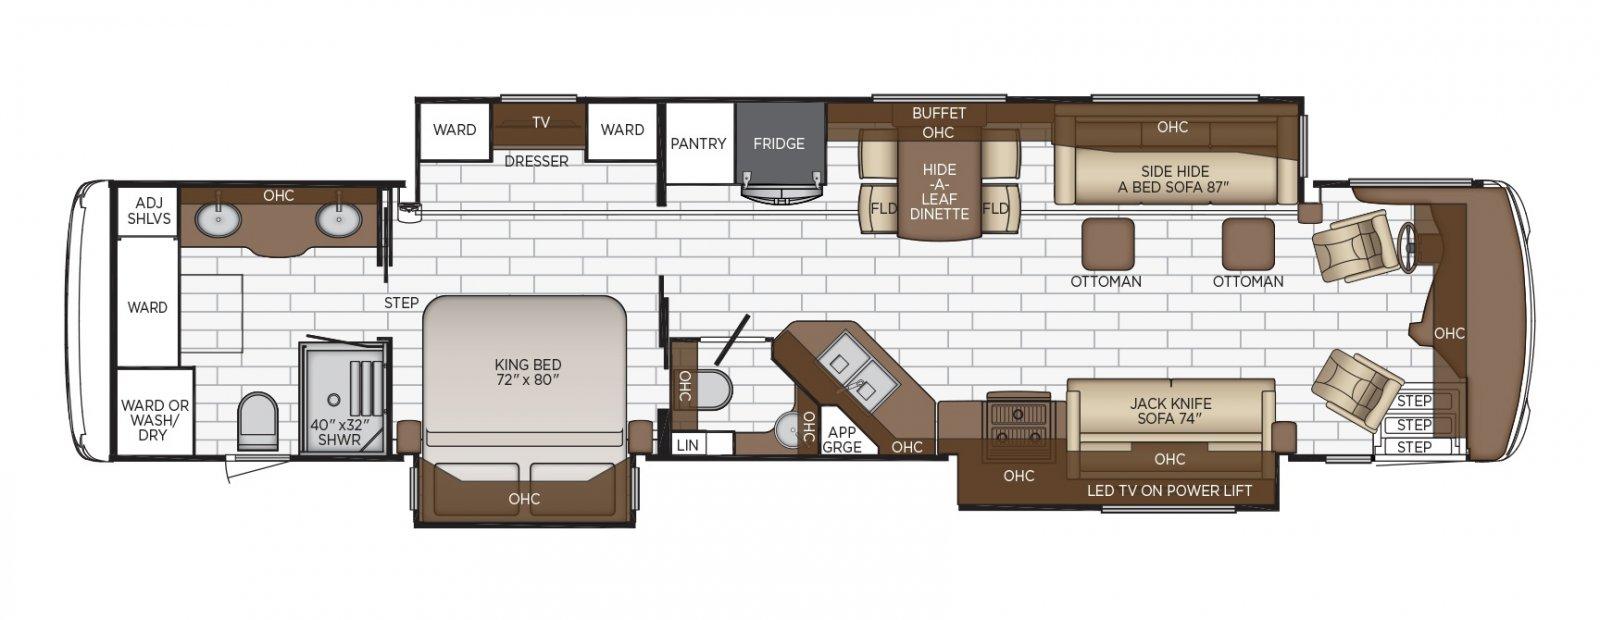 Click image for larger version  Name:2019-dutch-star-floorplan-4328.jpg Views:41 Size:120.7 KB ID:231972